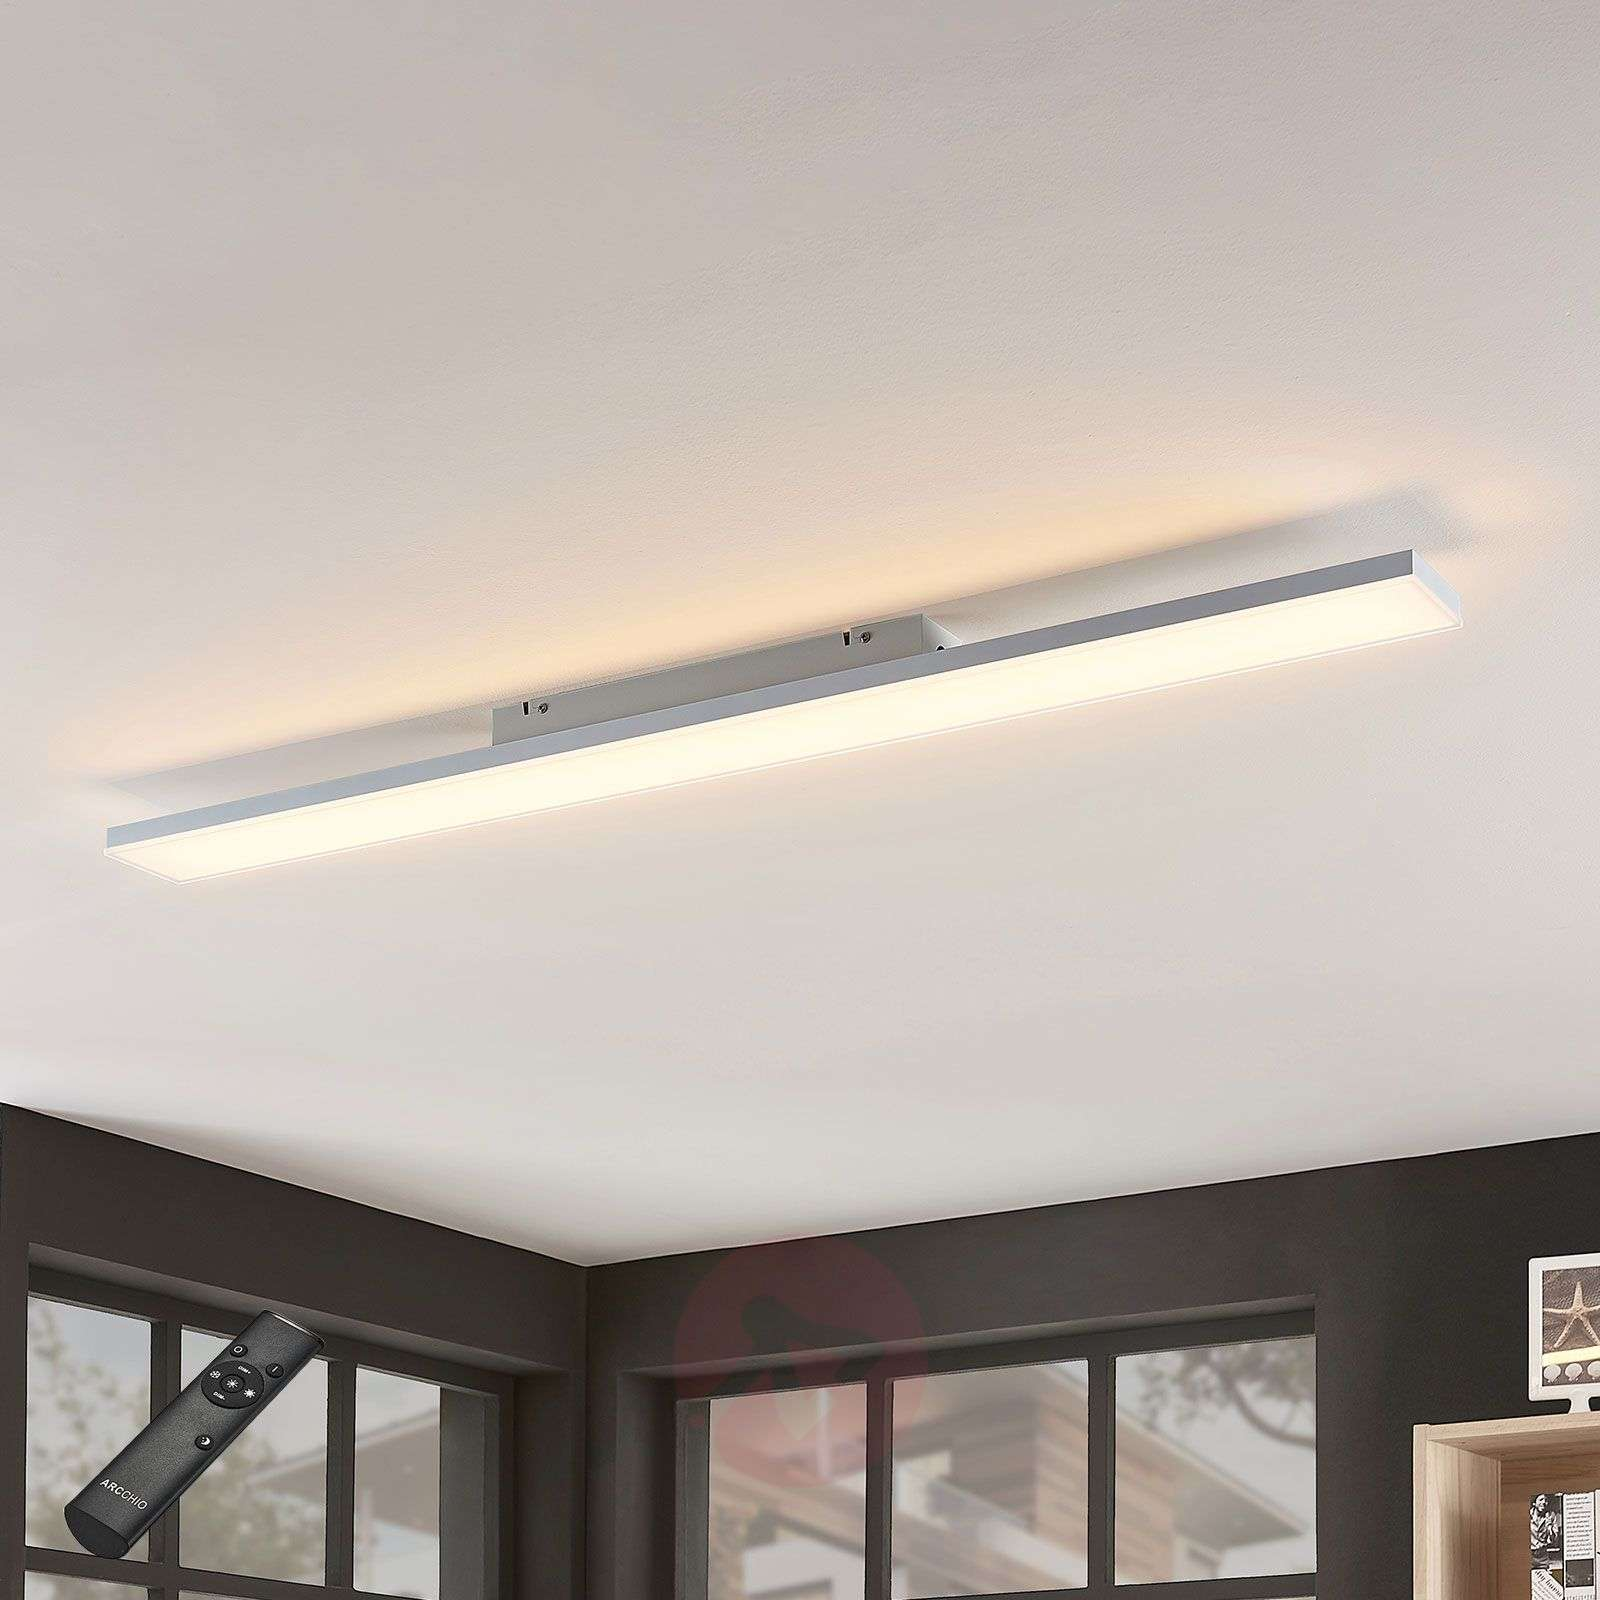 Blaan CCT LED panel with remote, 119.5 x 10cm-9624329-01